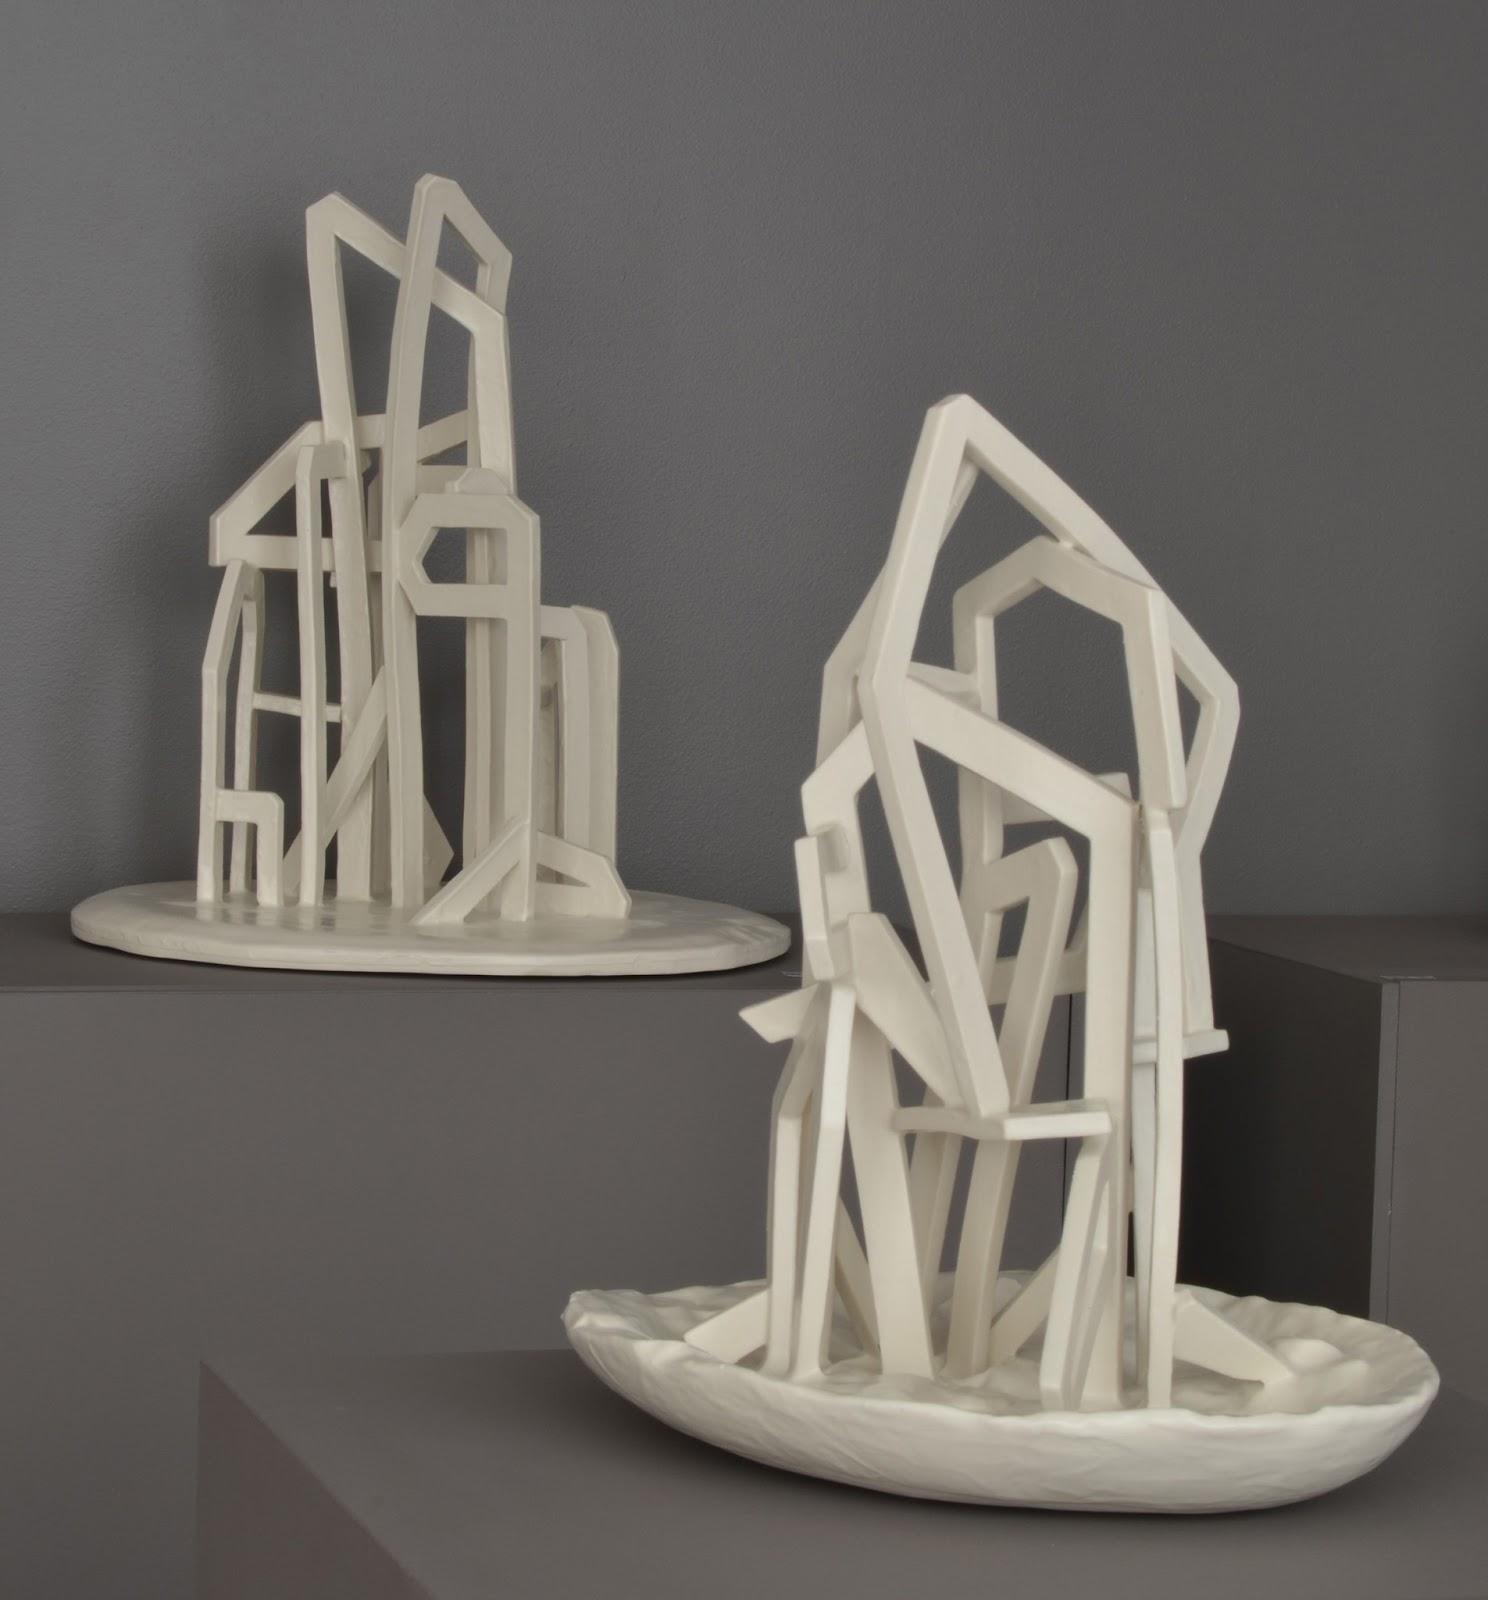 passion ceramique cl mentine dupr galerie accroterre. Black Bedroom Furniture Sets. Home Design Ideas